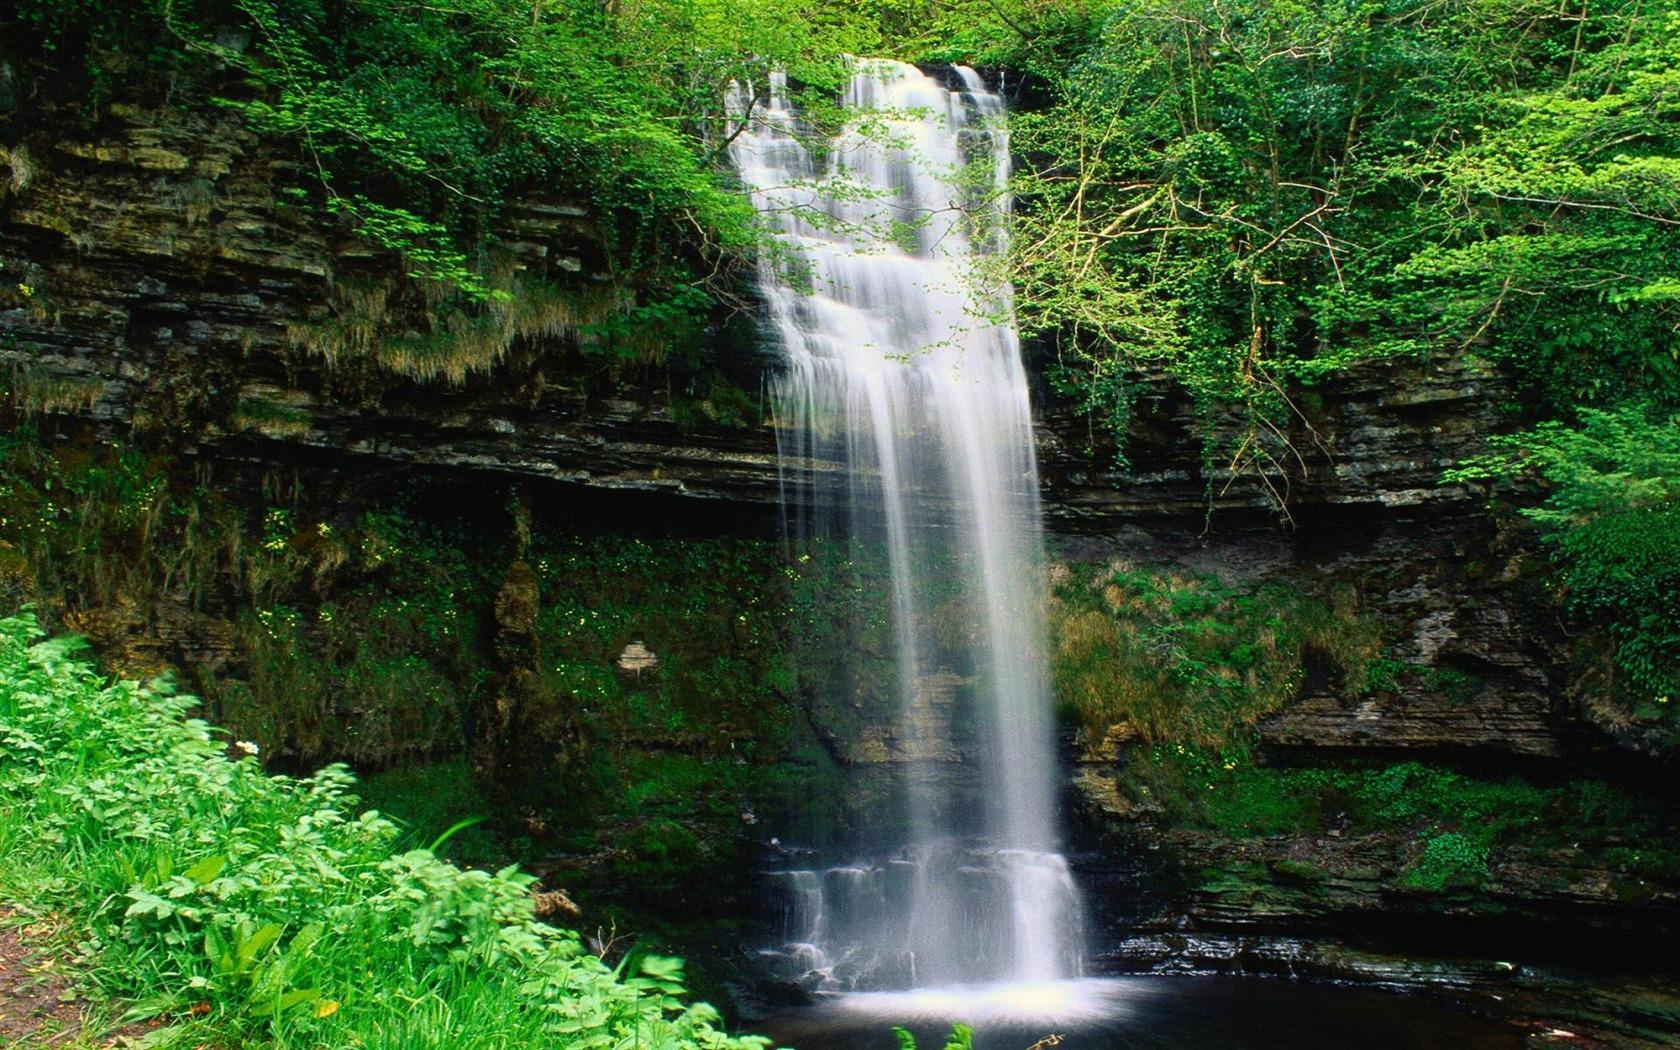 9 Spectacular Hd Waterfall Wallpapers To Download: Spectacular Waterfalls Widescreen Desktop Wallpaper 08